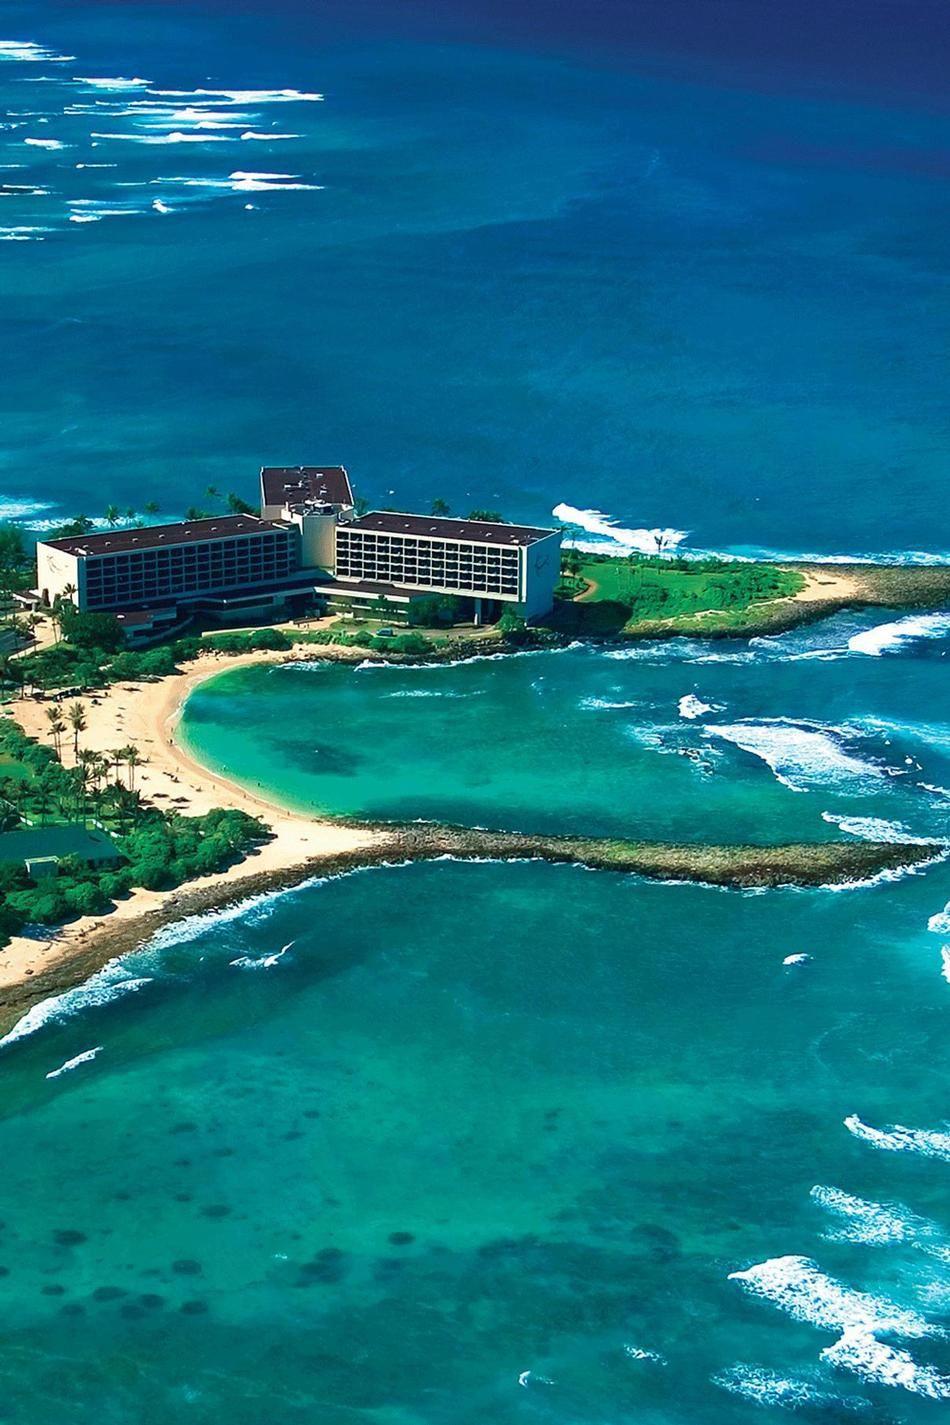 Turtle Bay Scenic Beach Resort On Oahu S North Where We Spent Our Honeymoon